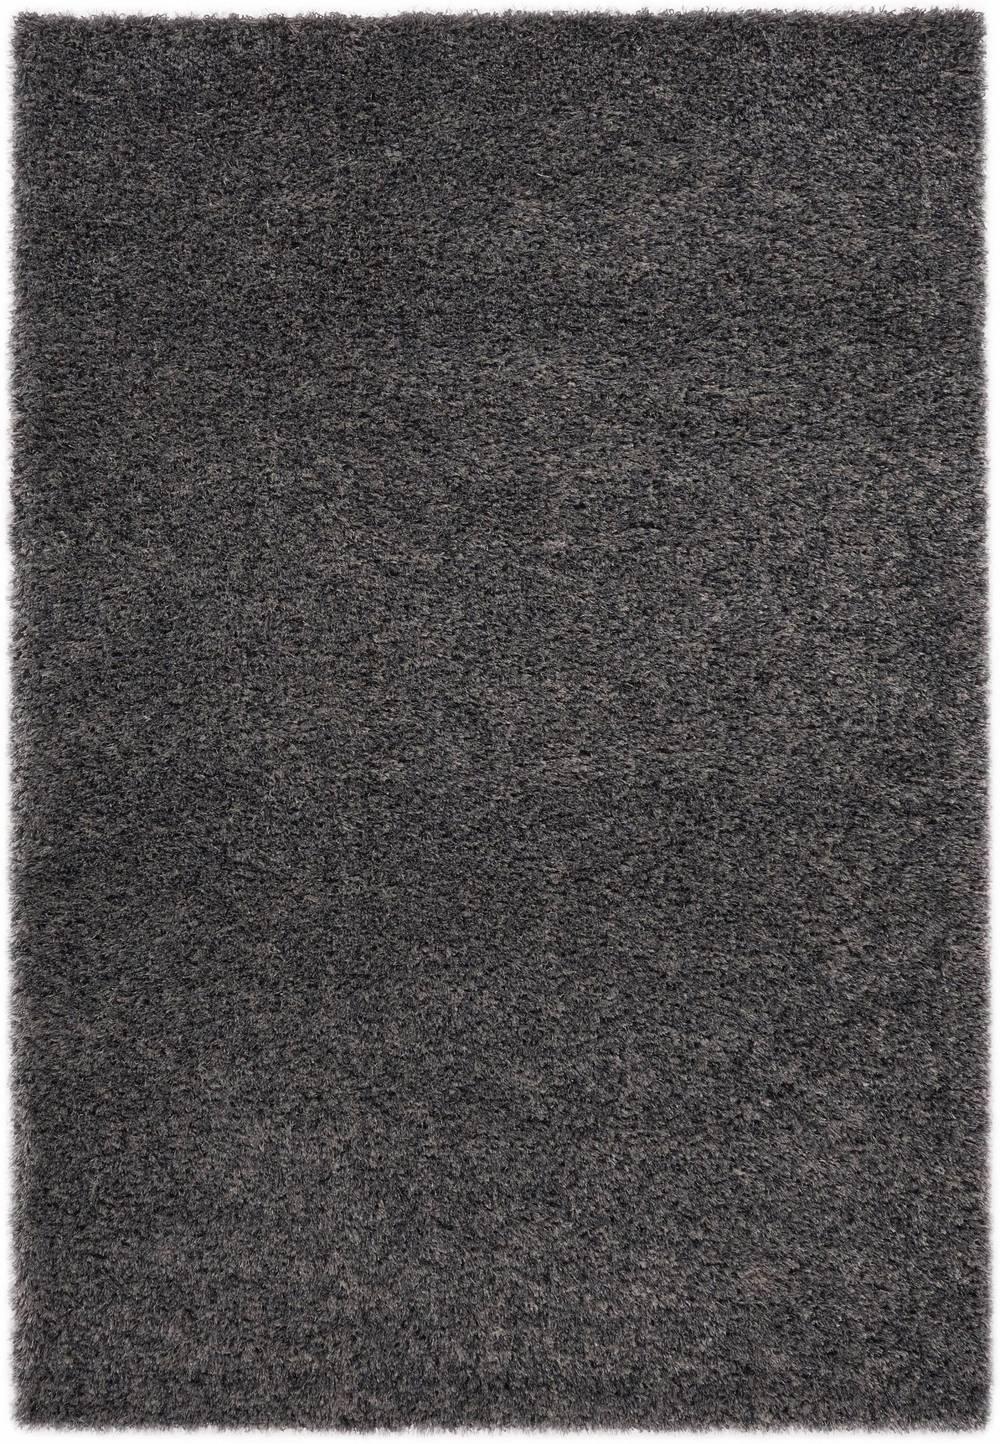 "Citak Rugs - Solid Graphite Mix 5'3"" x 7'7"" Rug"